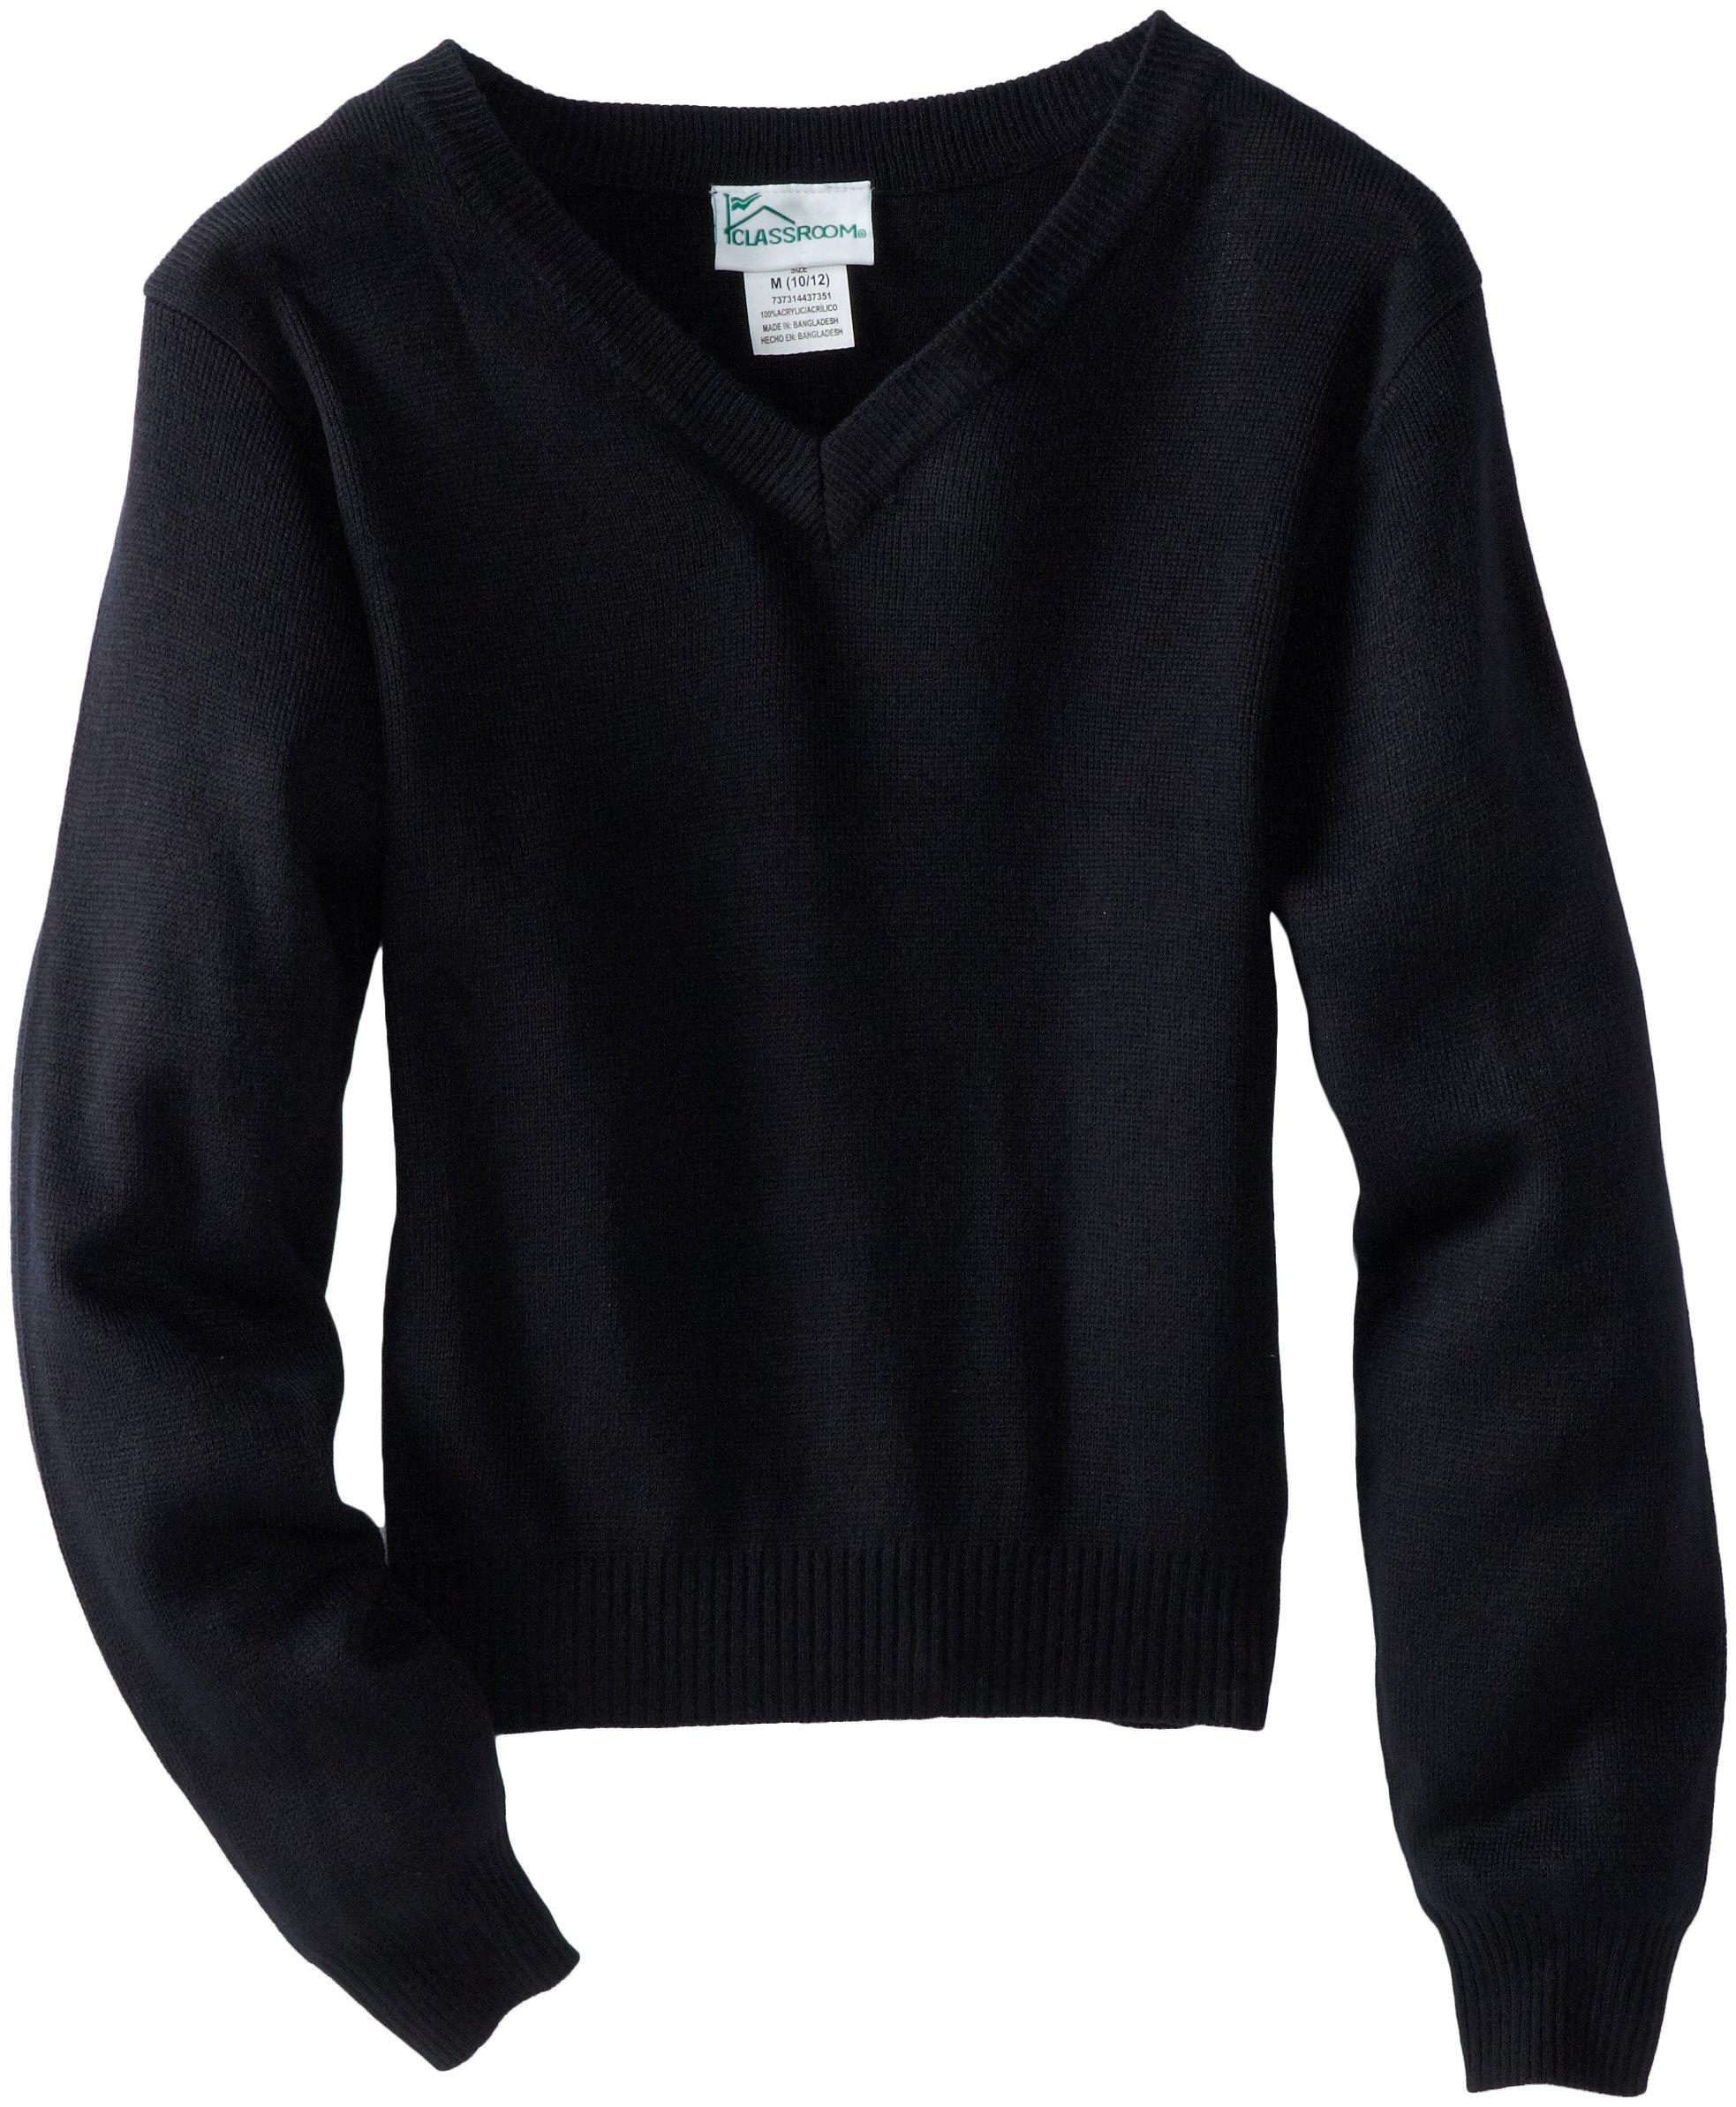 CLASSROOM Big Boys' Uniform Long Sleeve V-Neck Sweater, Black, Large